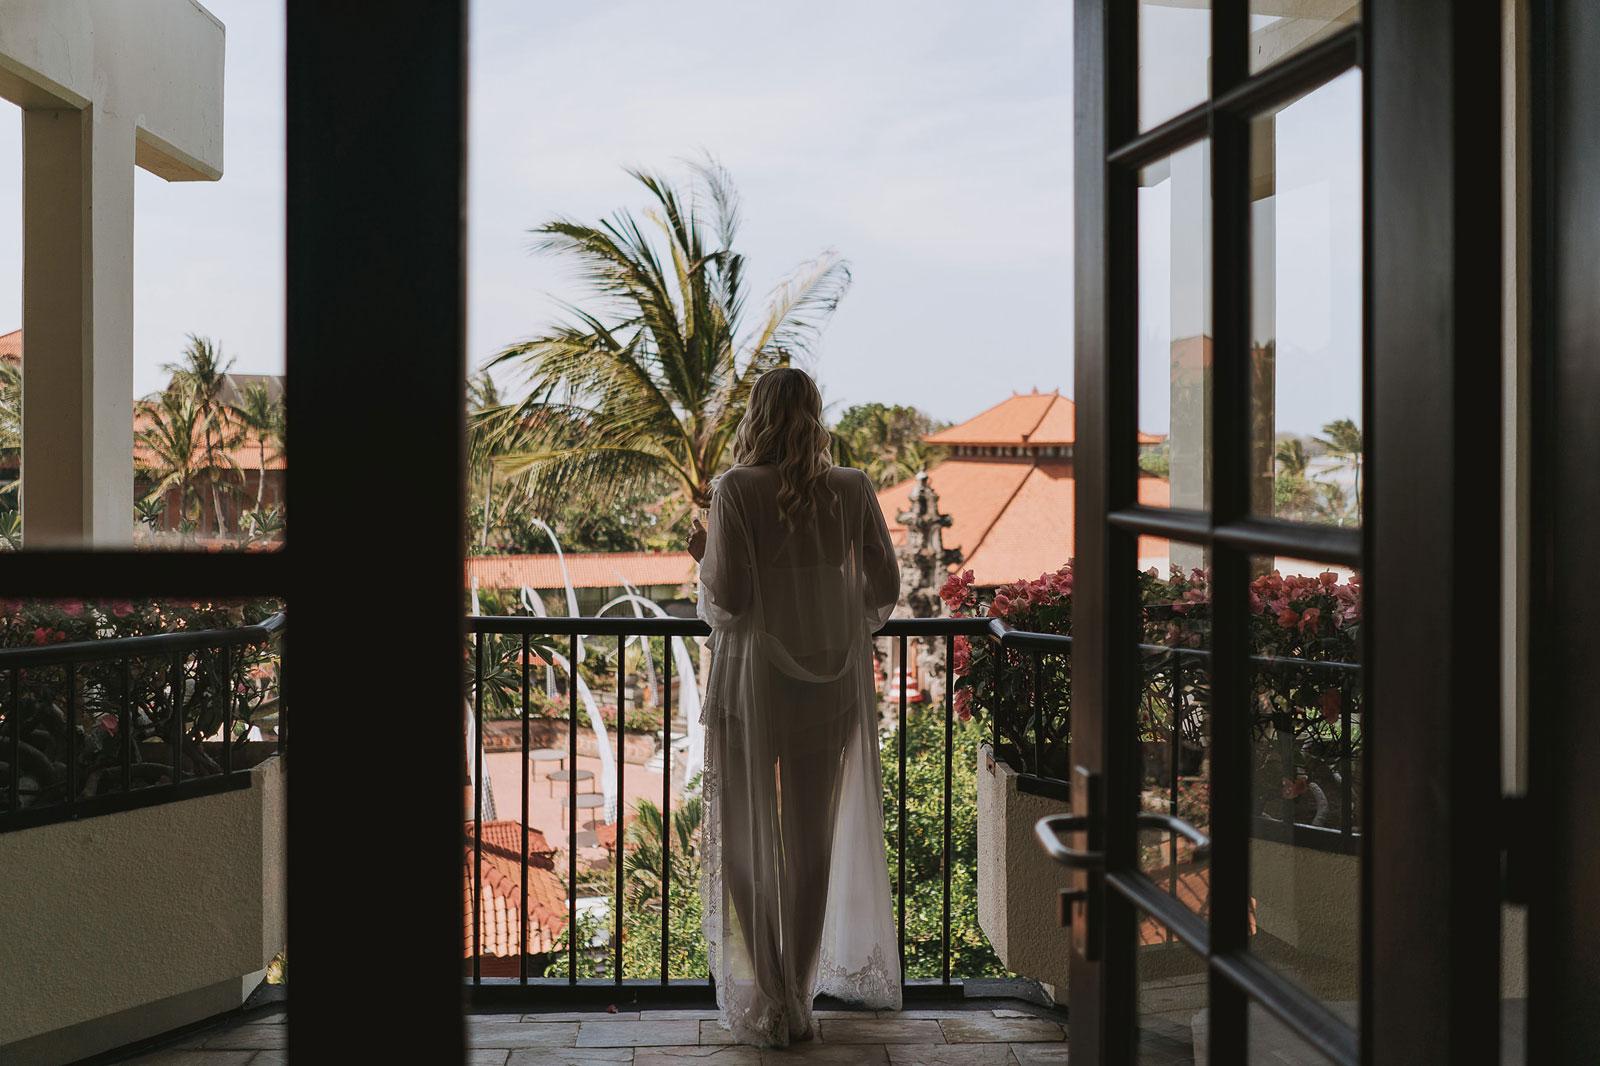 newfound-j-j-bali-nusa-dua-wedding-wedding-photographer-013-a